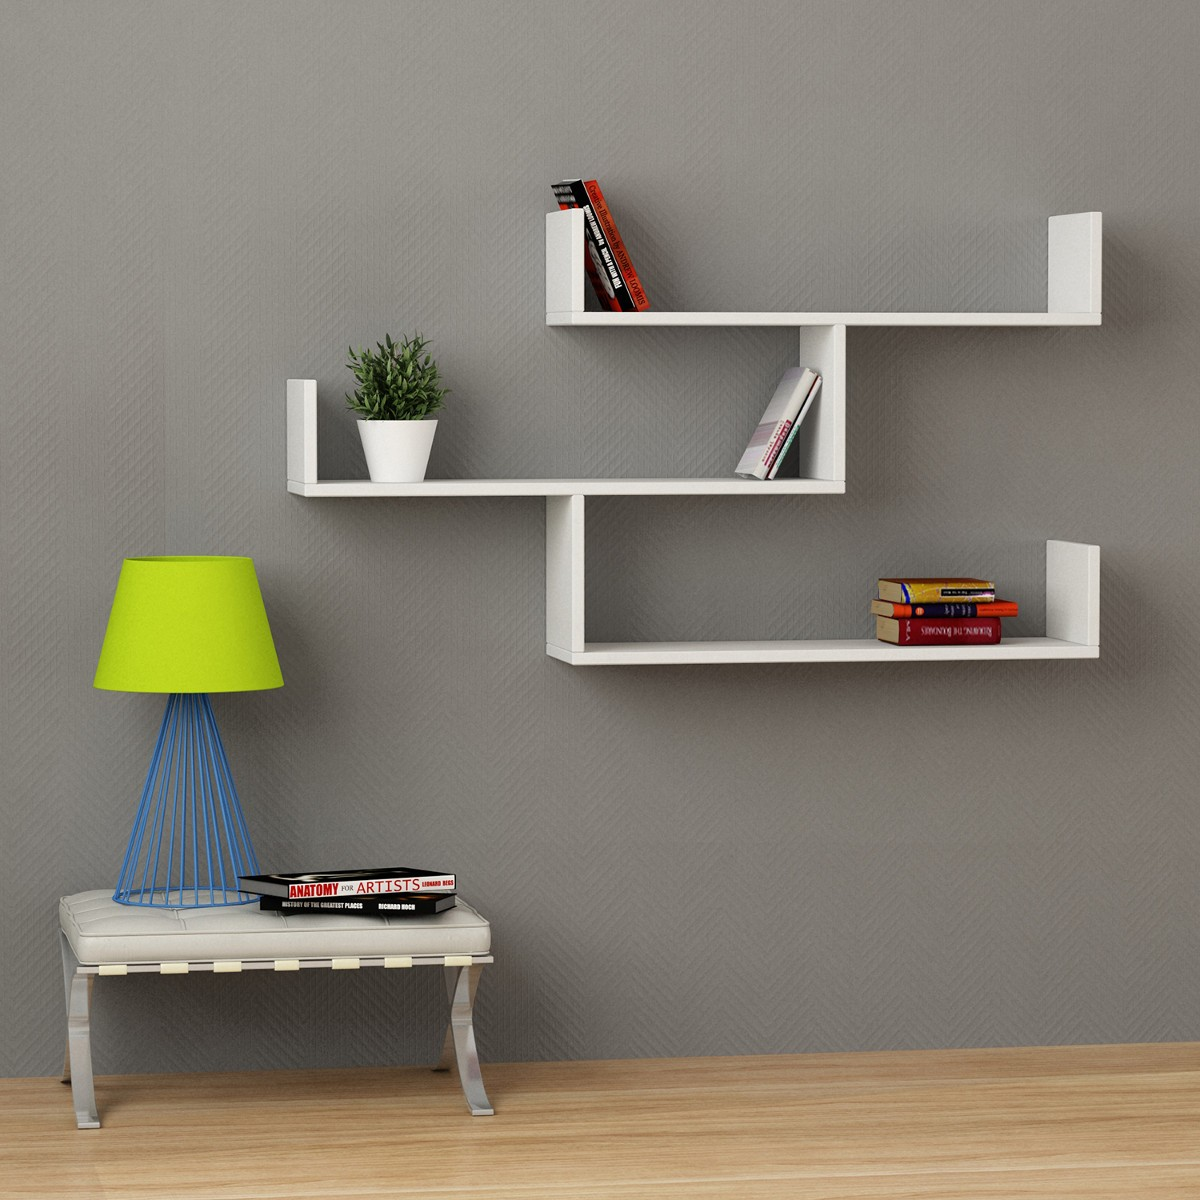 Amazing librerie sospese a muro libreria a muro moderna in melamminico with immagini librerie - Librerie ikea catalogo ...